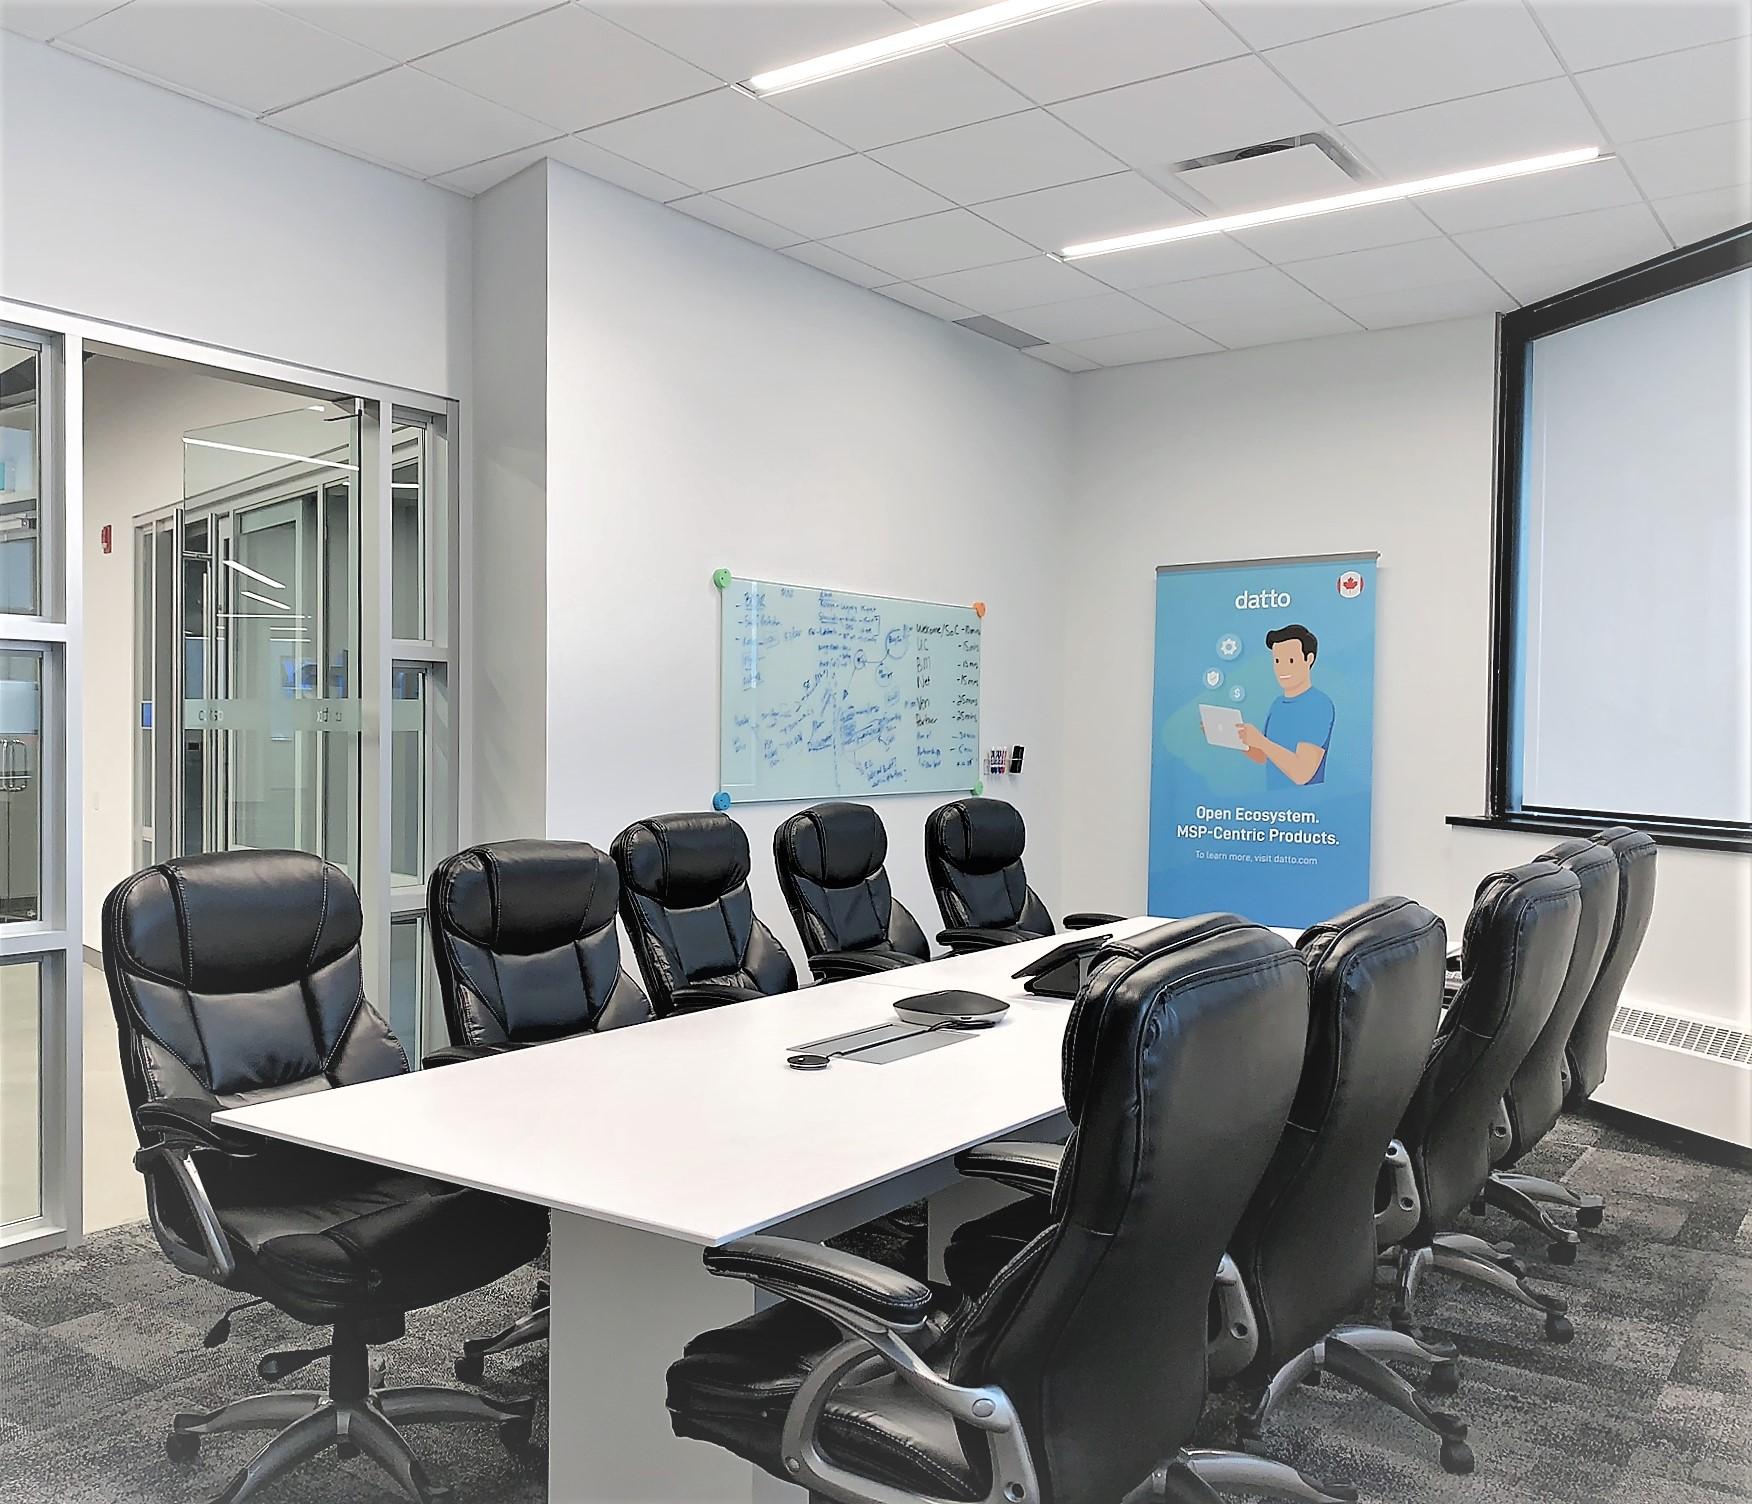 Datto - Boardroom 3.jpeg